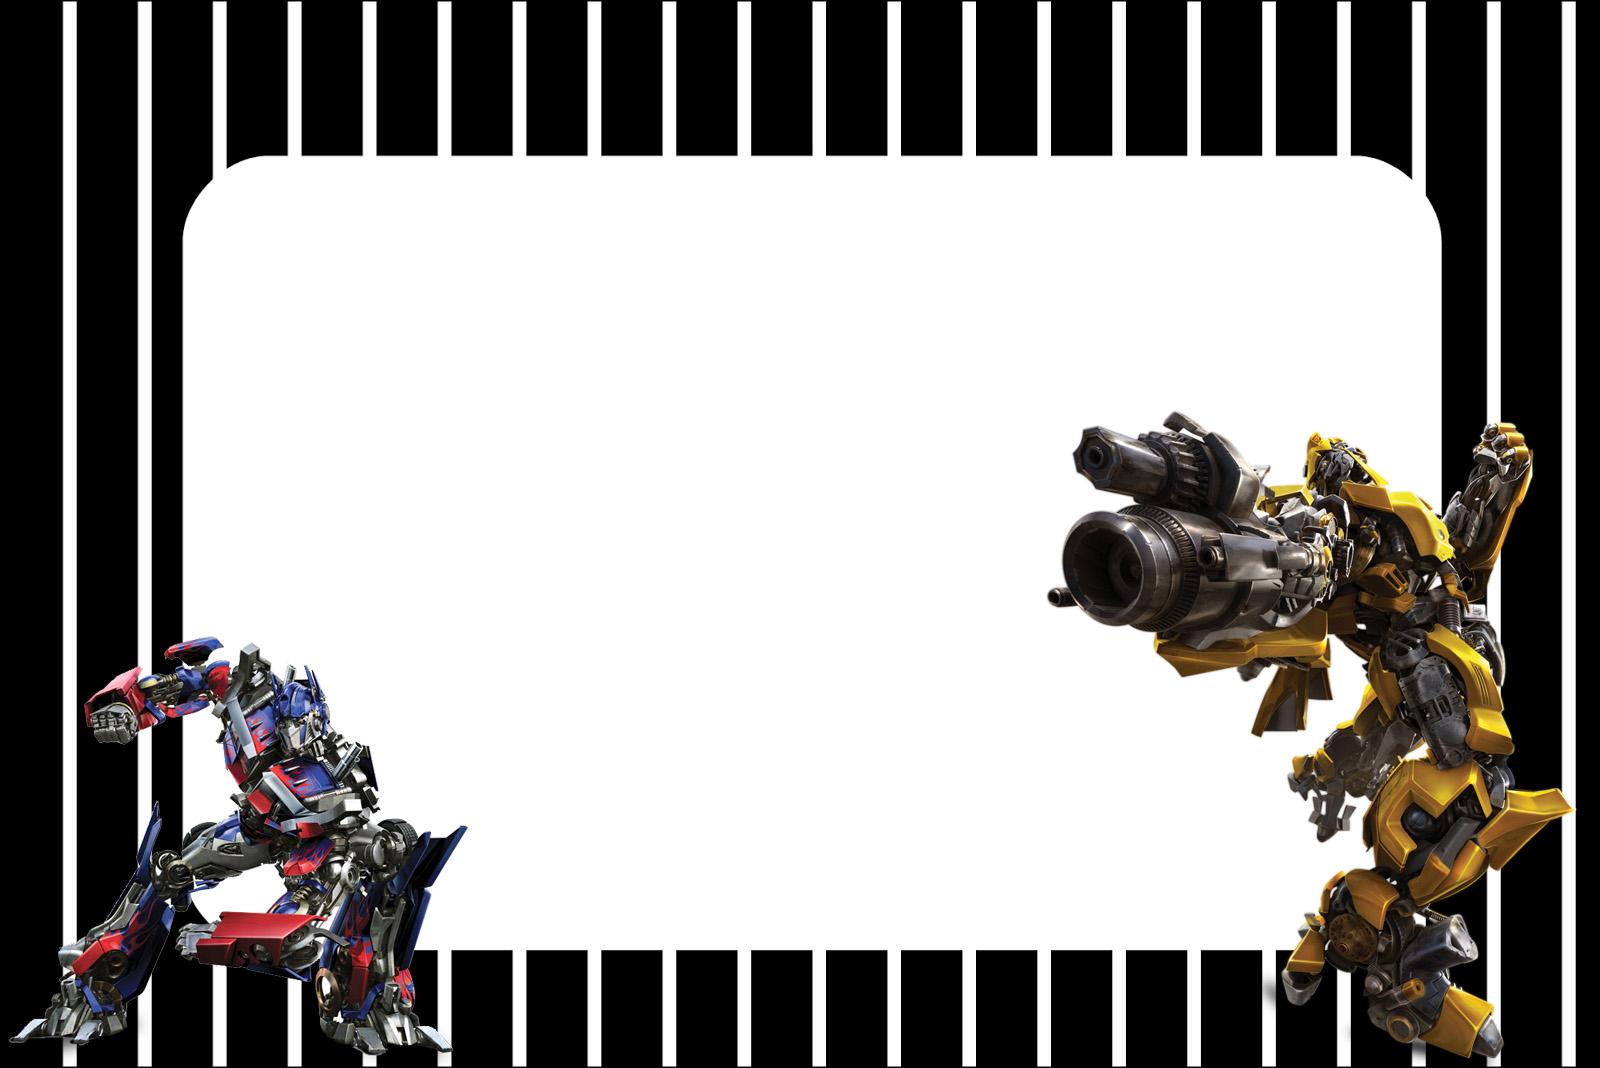 Transformers: Free Printable Invitations. - Oh My Fiesta! For Geeks - Transformers Party Invitations Free Printable